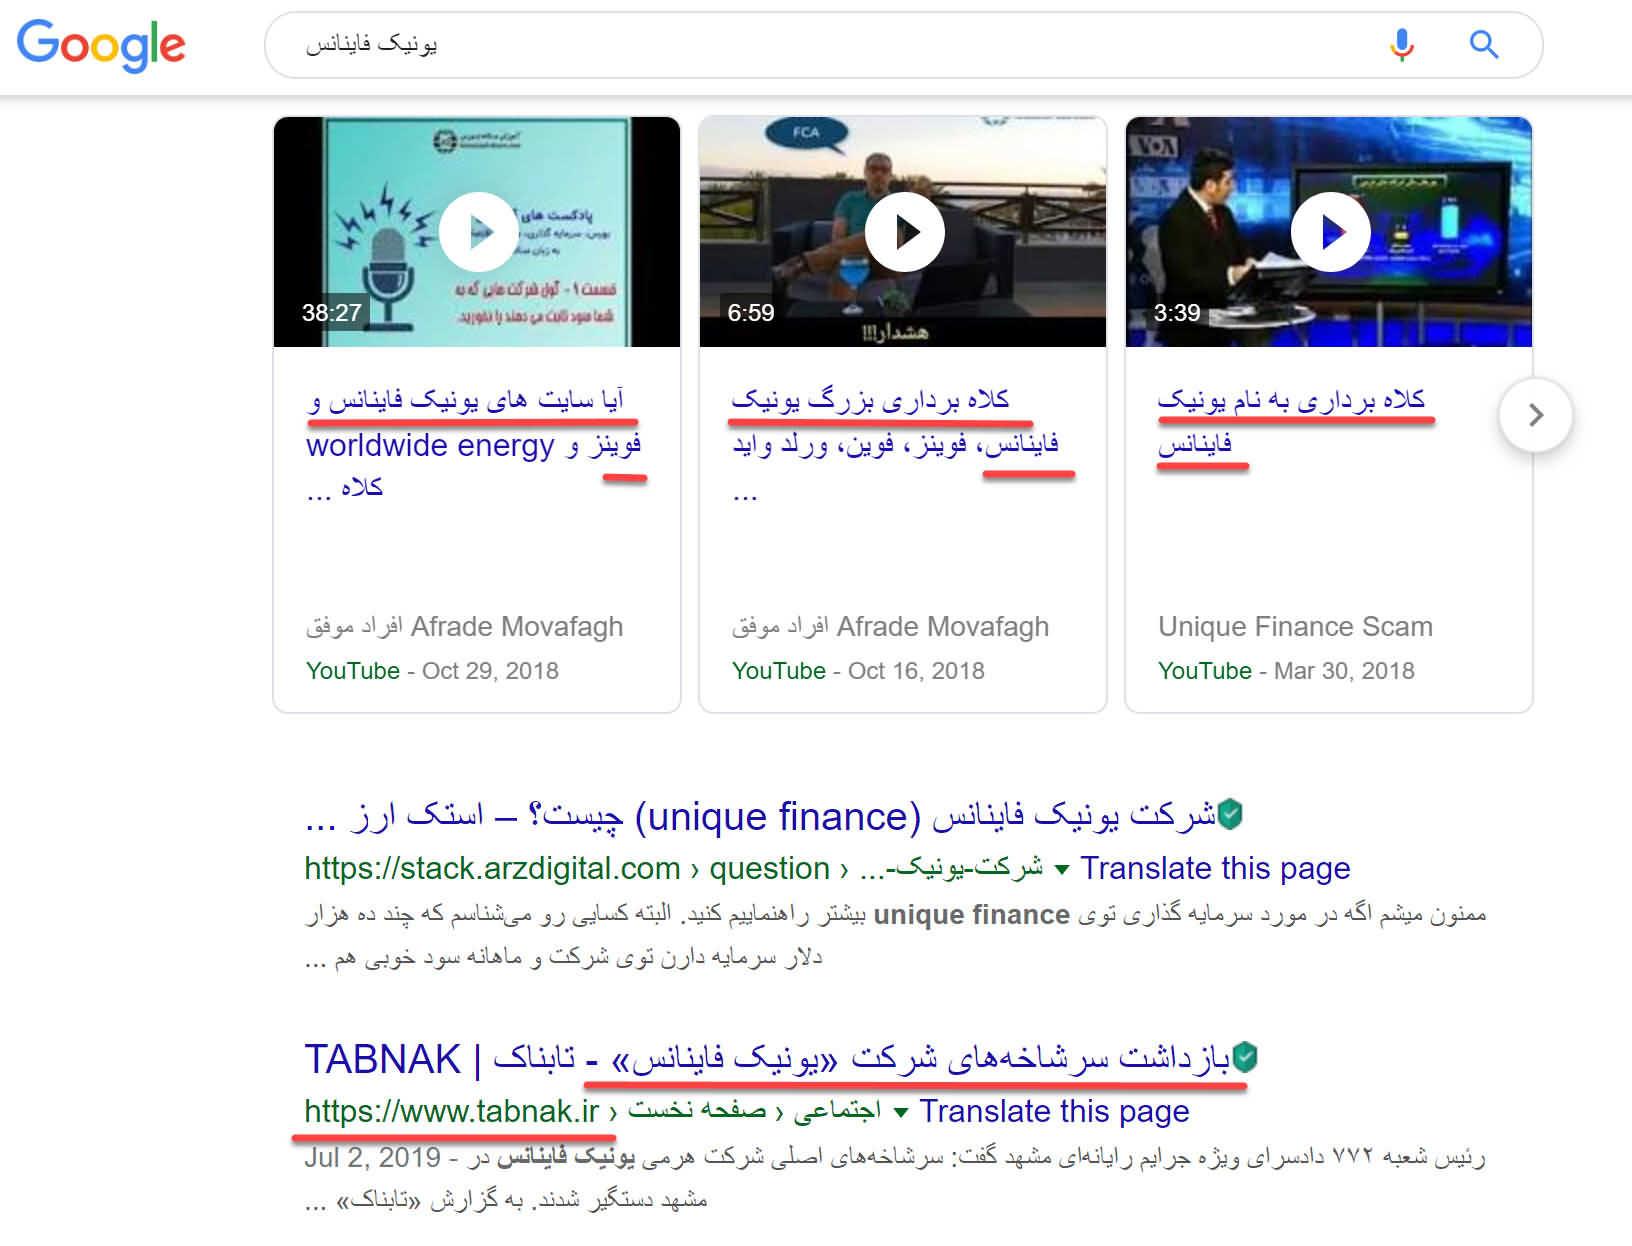 یونیک فاینانس گوگل 2